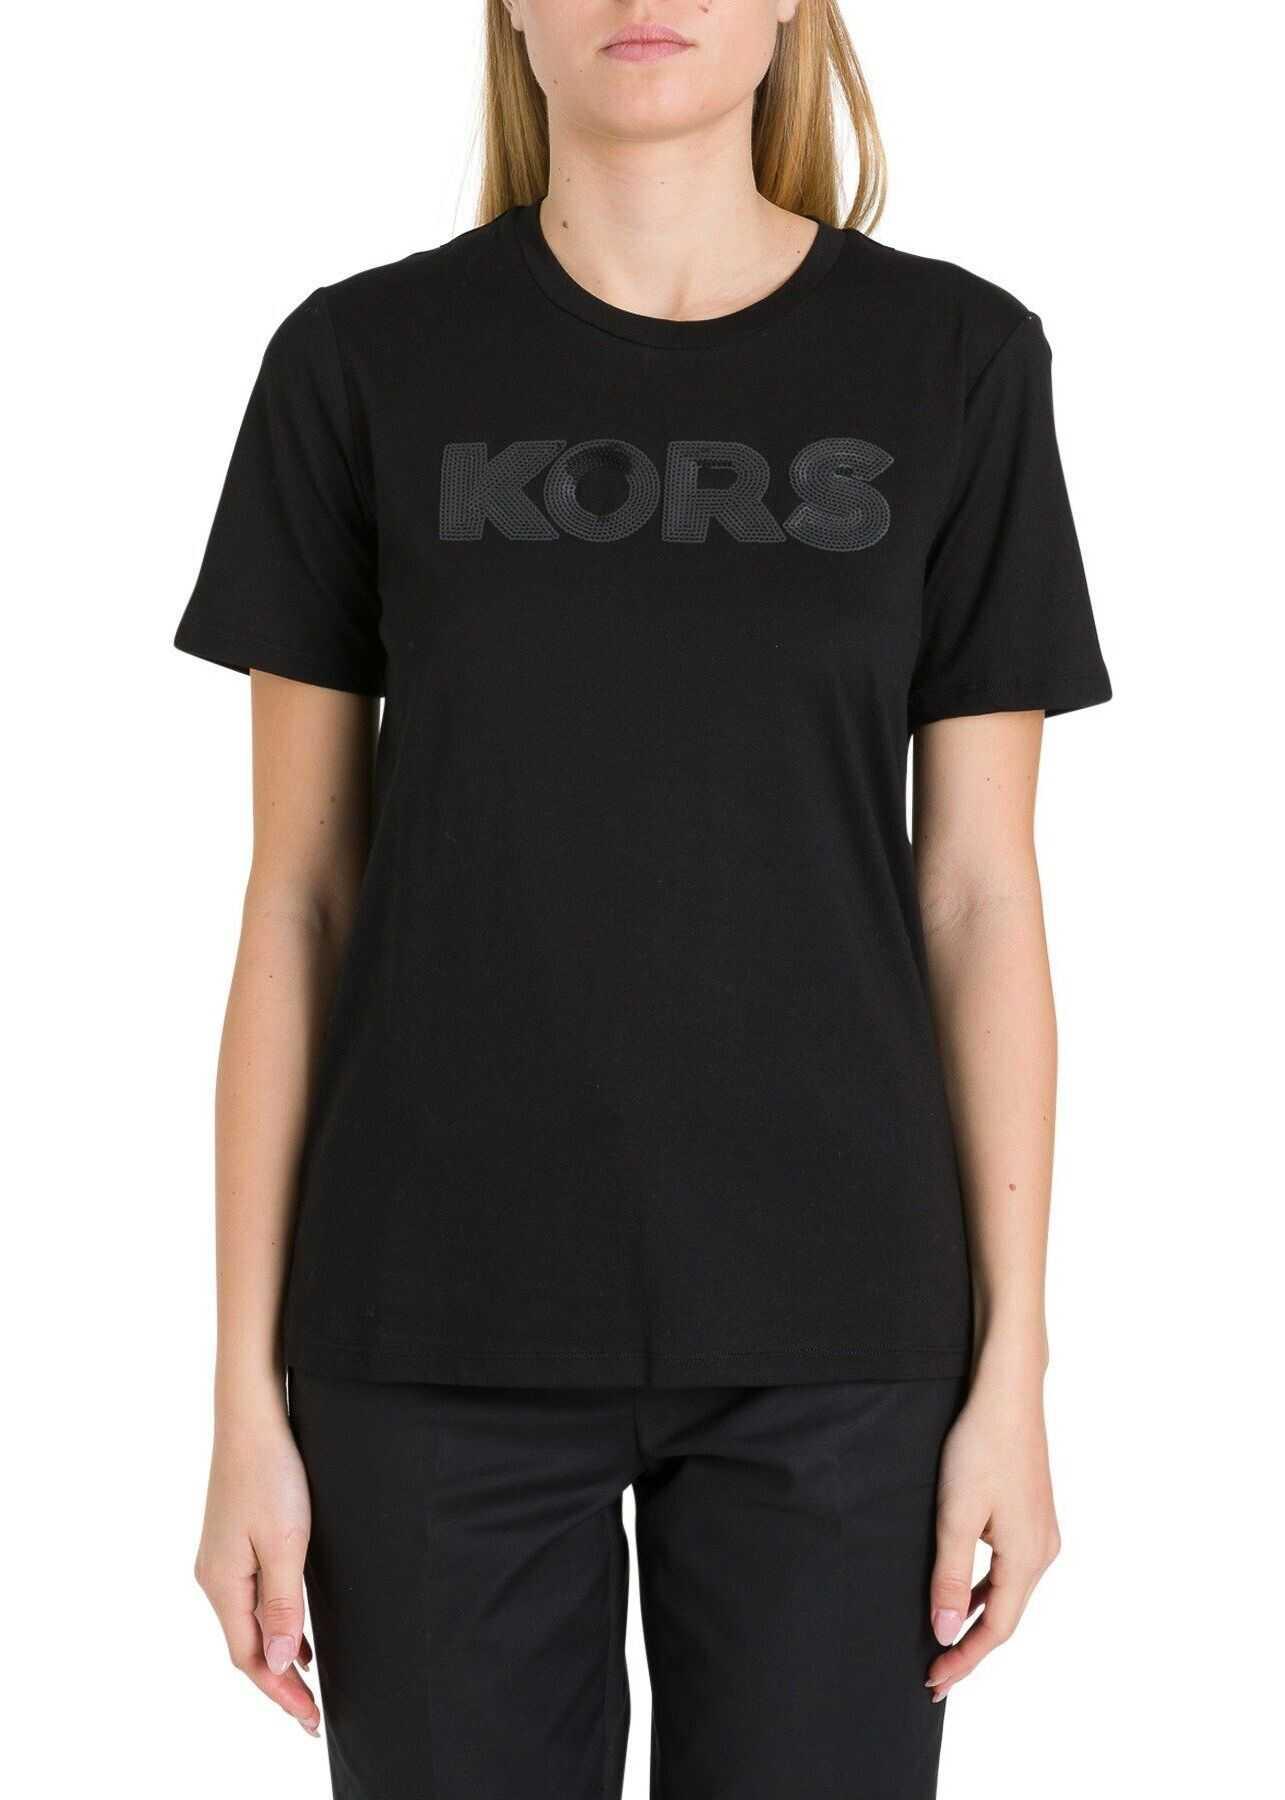 Michael Kors Cotton T-Shirt BLACK